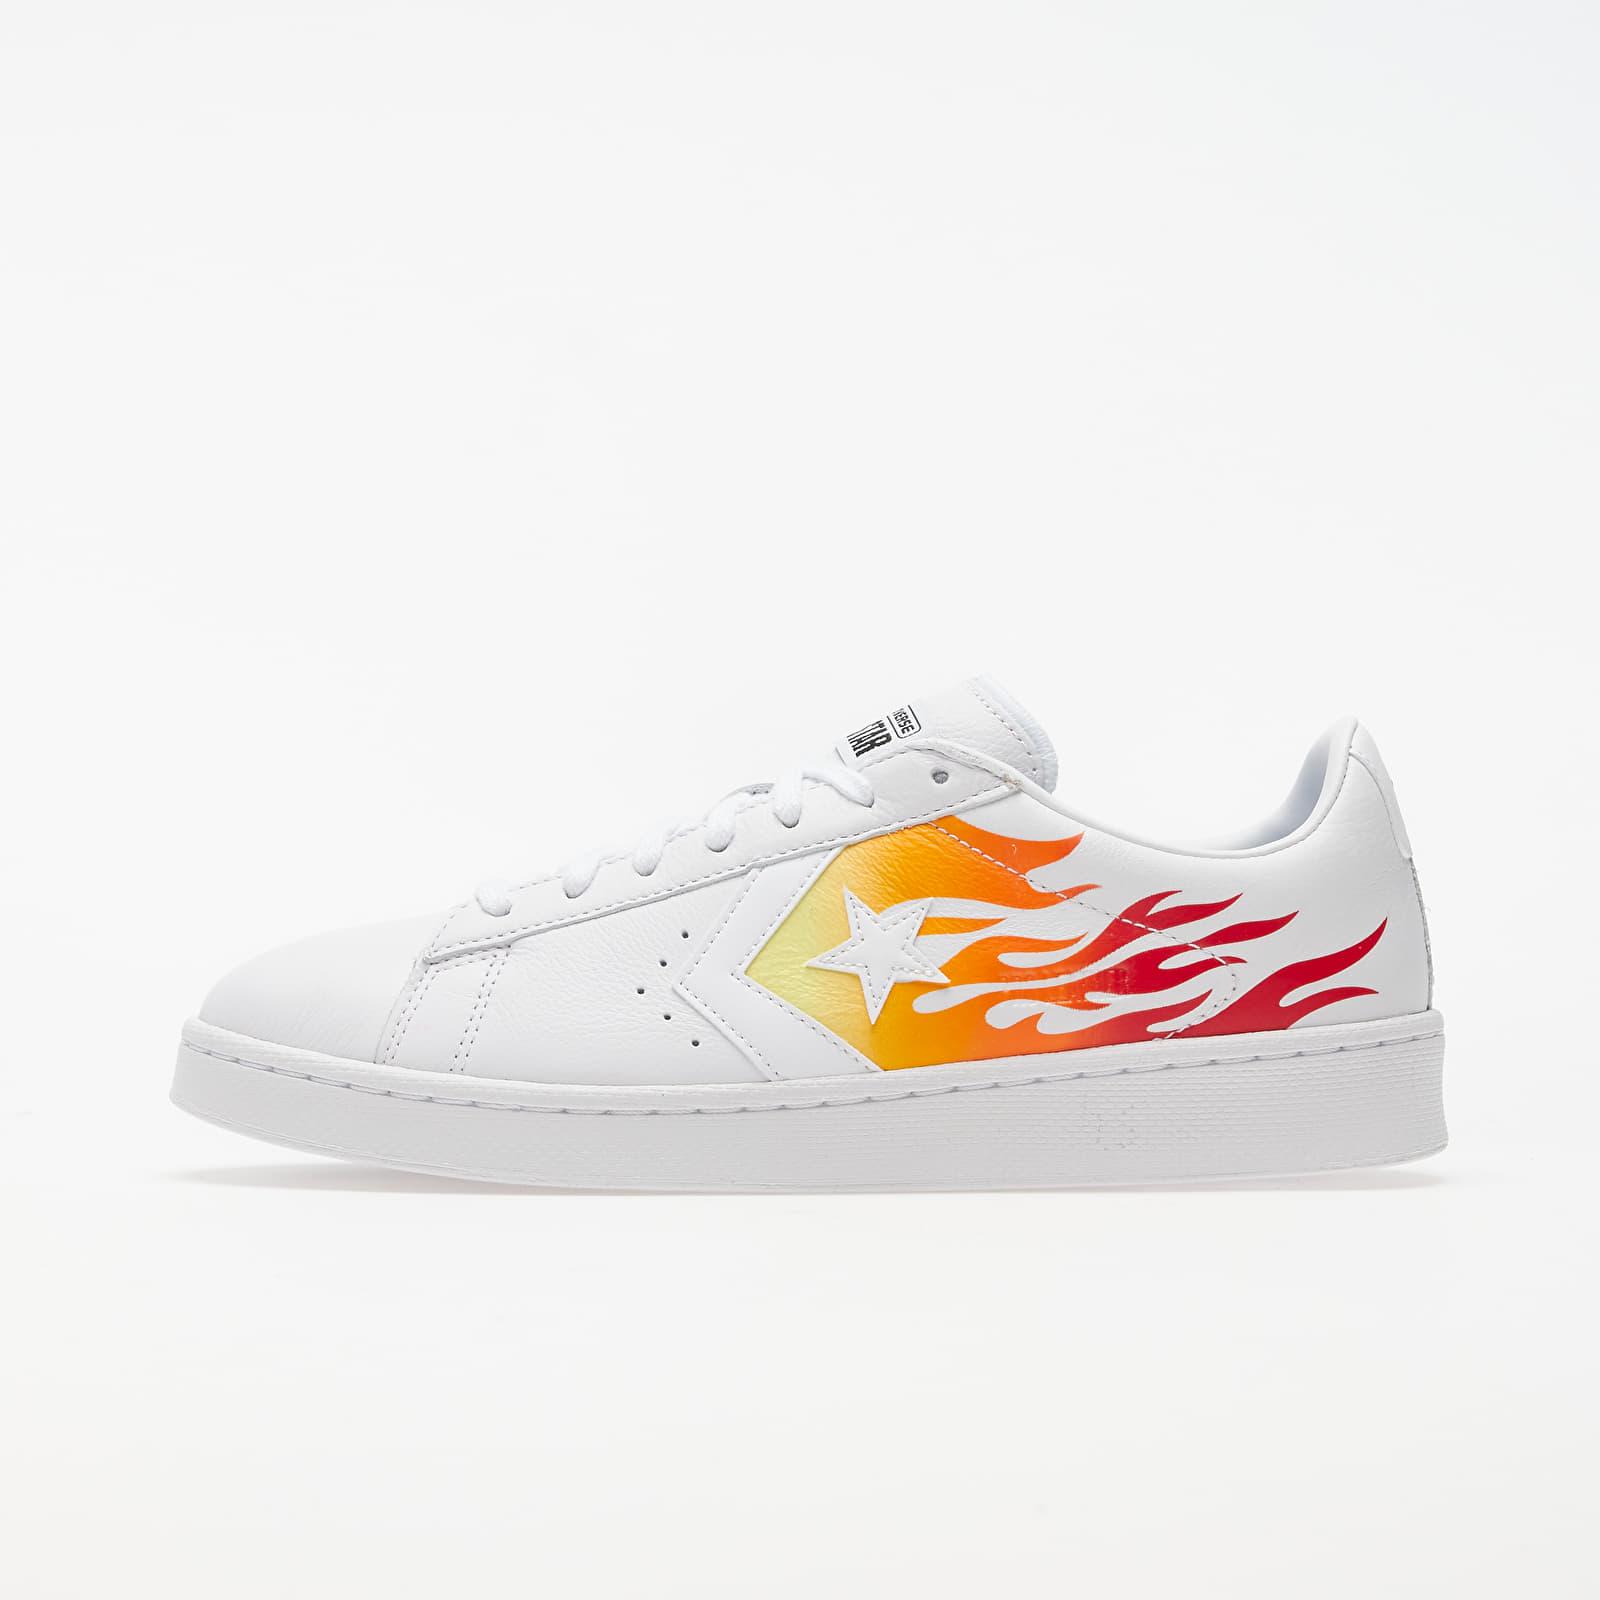 Men's shoes Converse Pro Letaher OX White/ Bold Mandarin/ Enamel Red